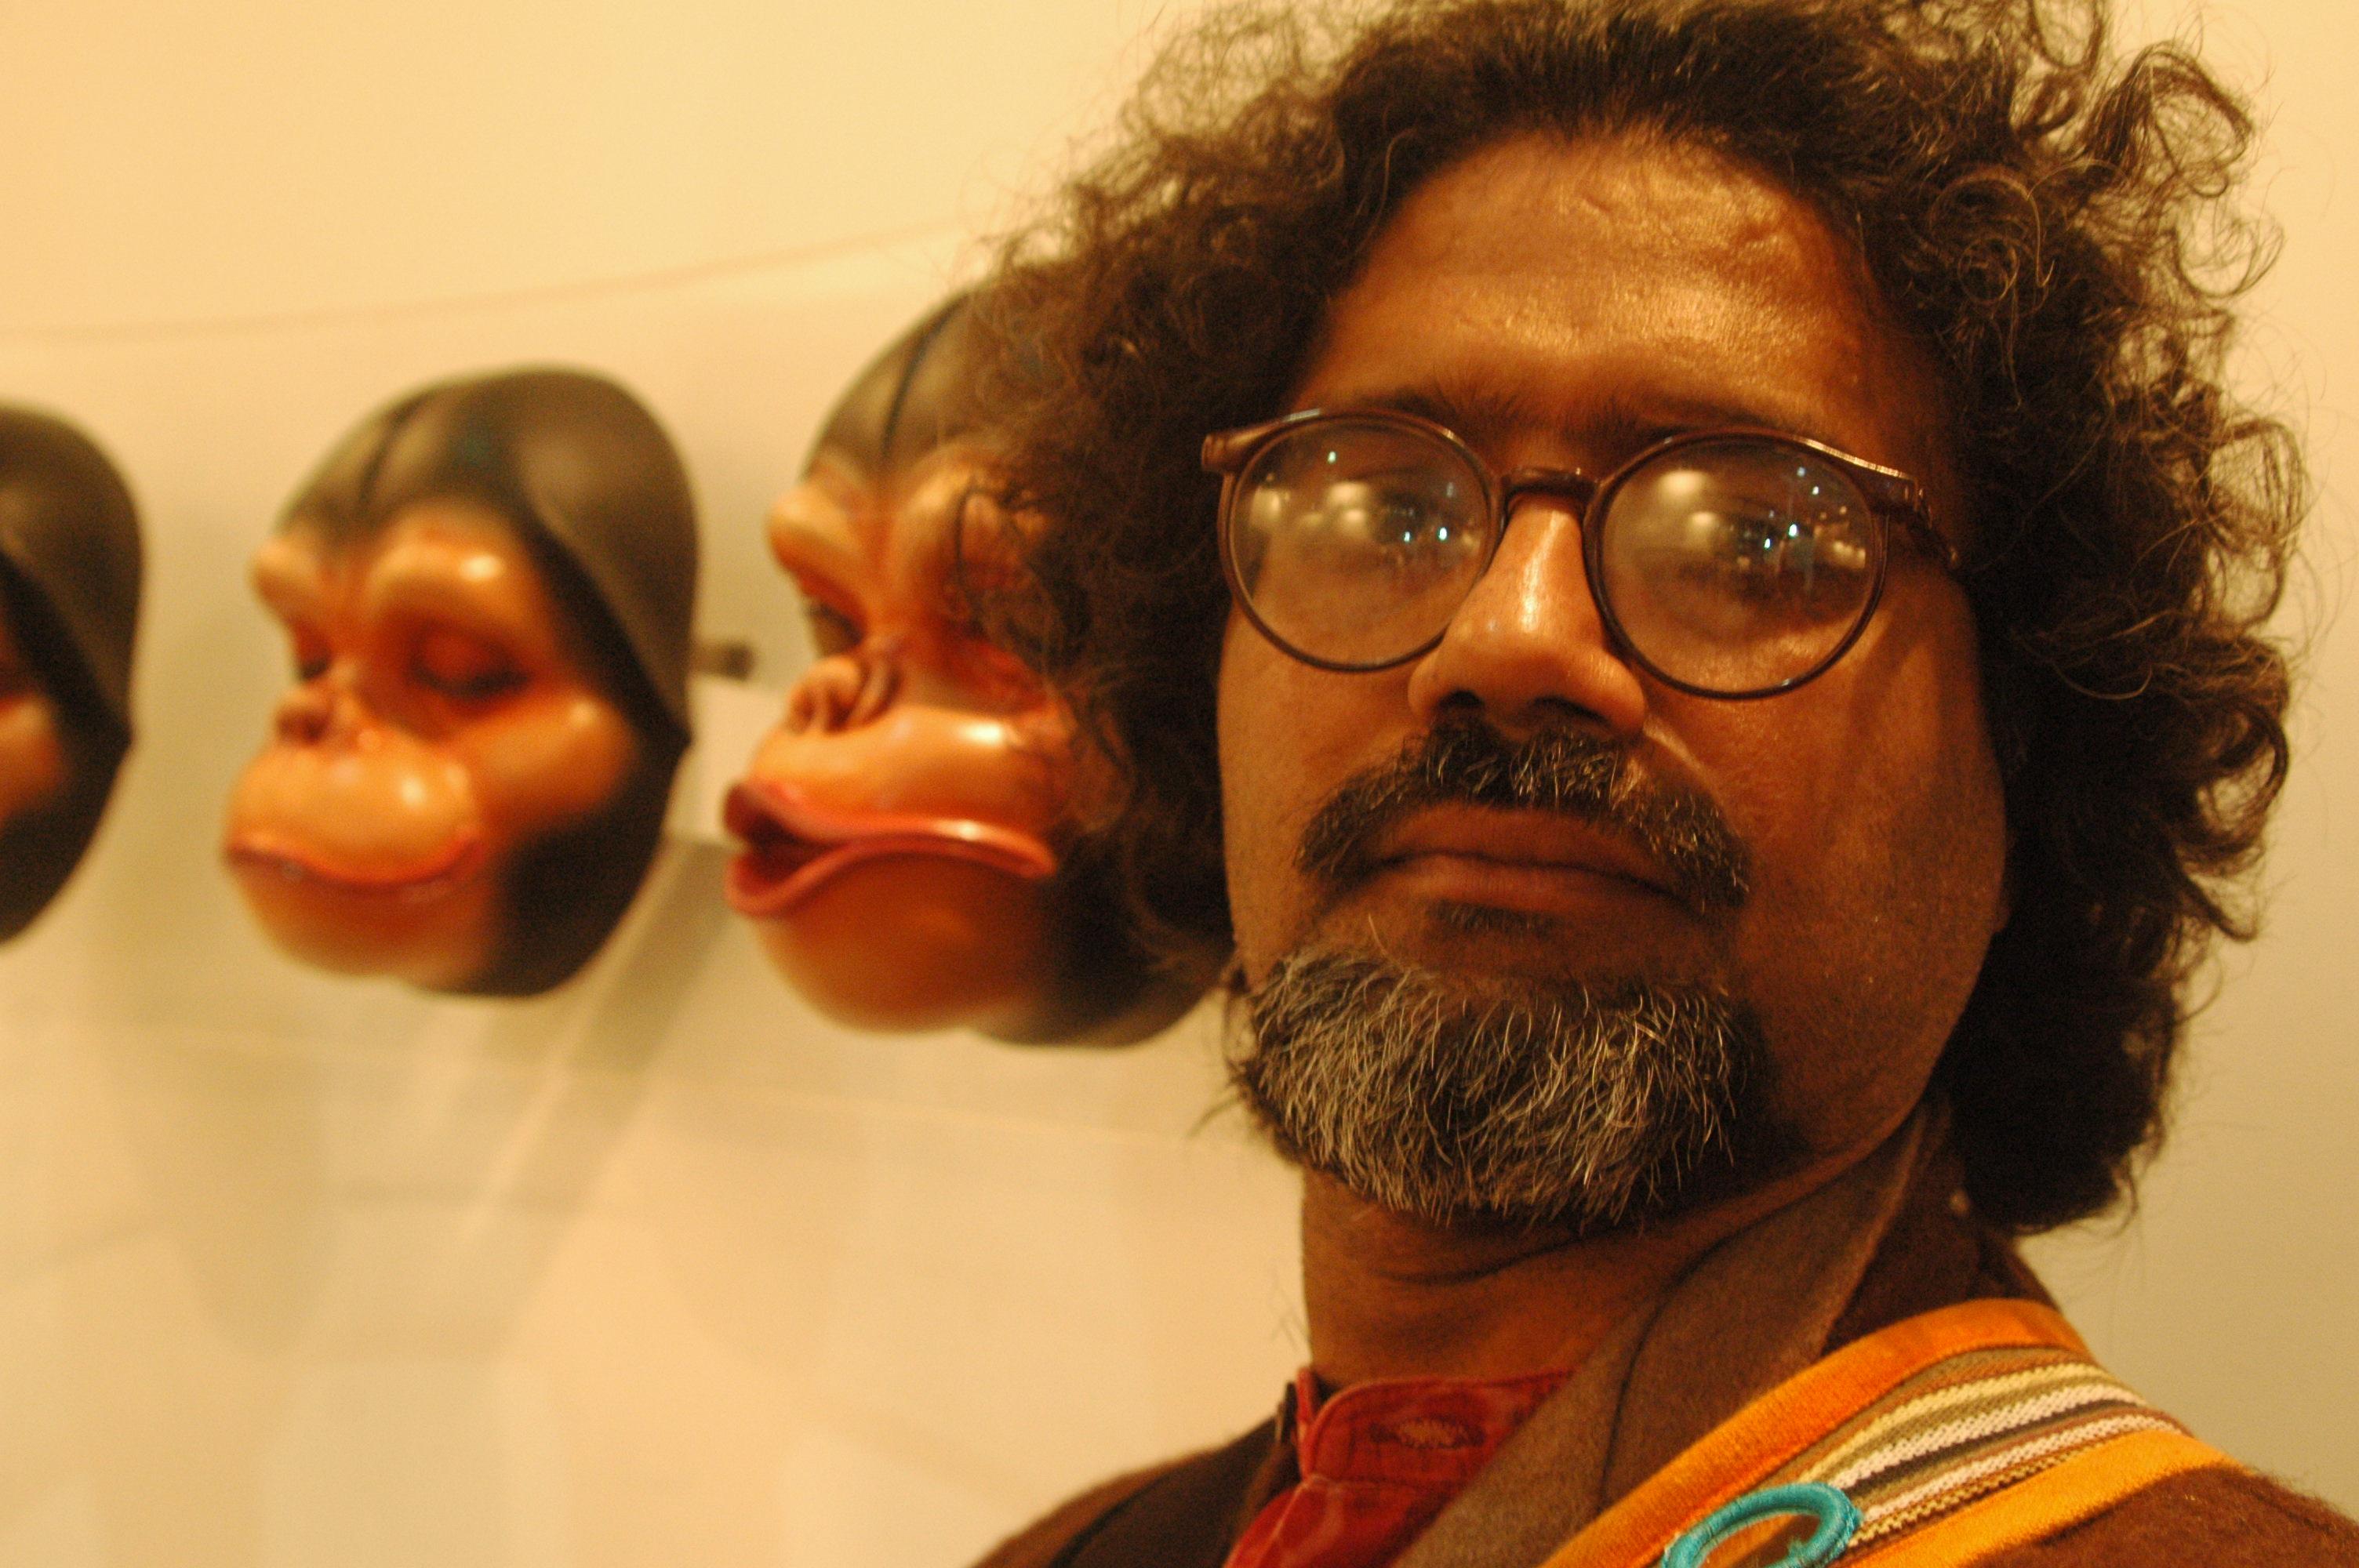 The progression, for the worse? India Art Summit, New Delhi, India